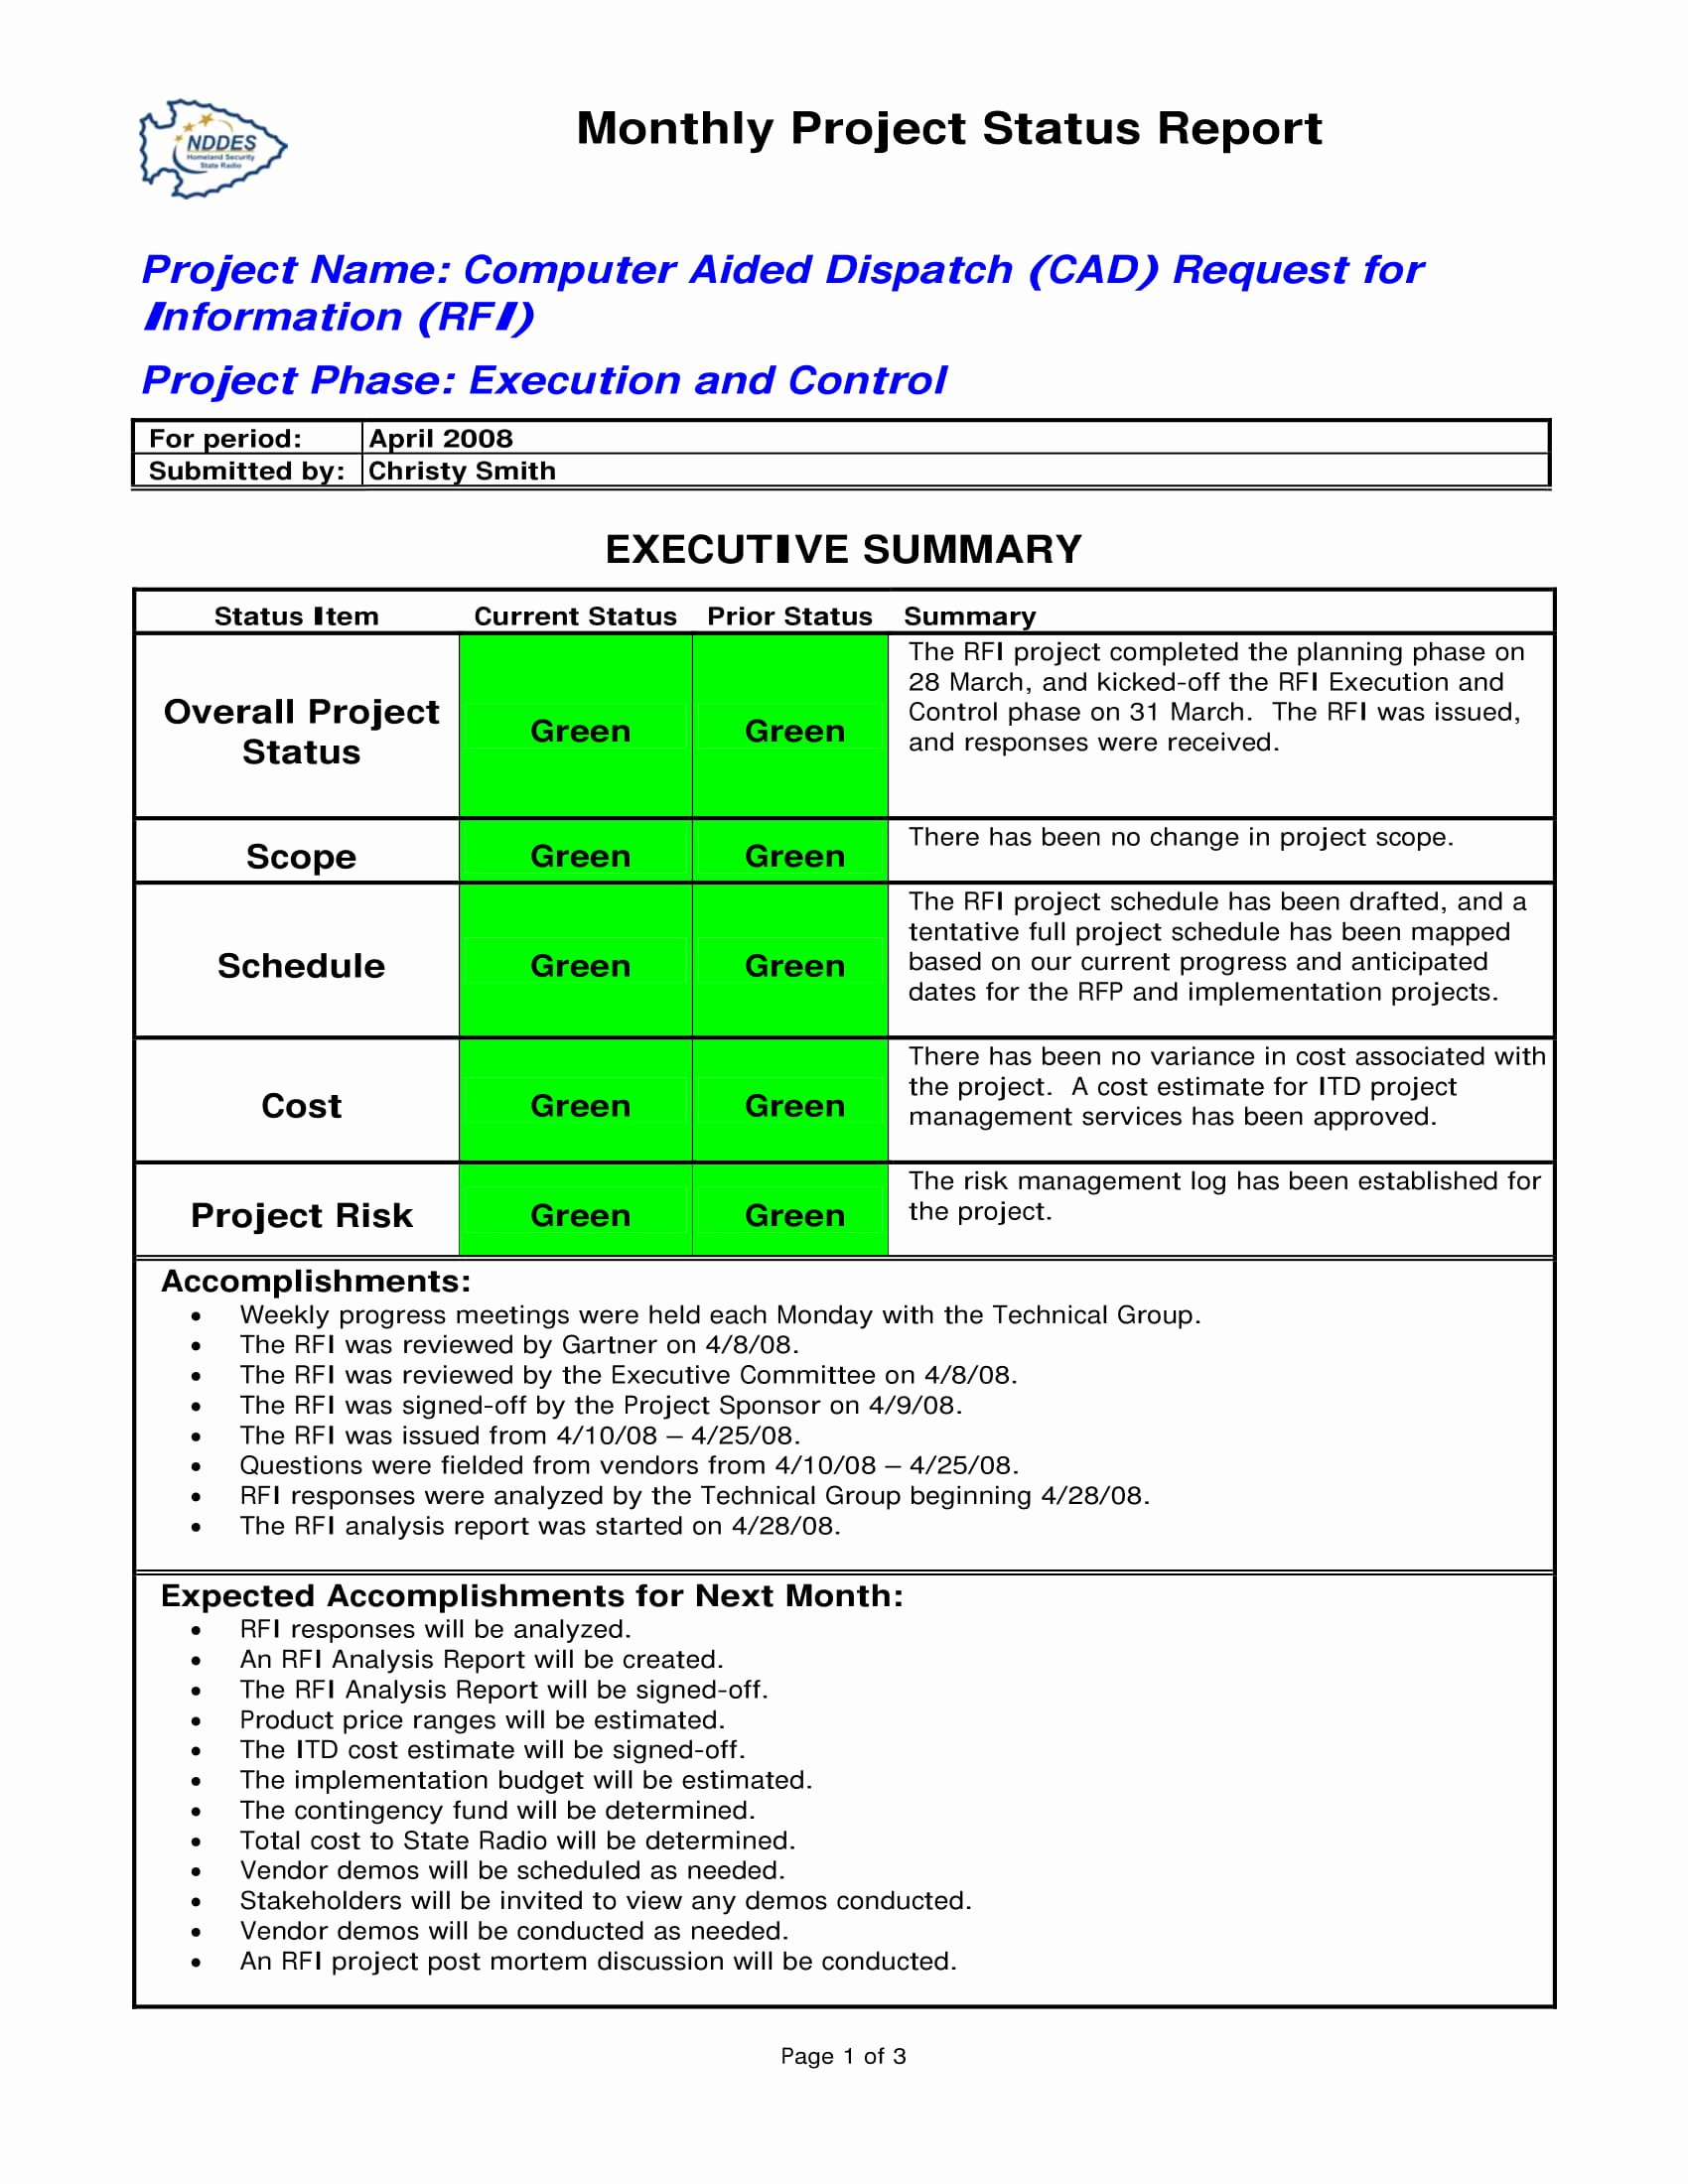 Executive Status Report Template Luxury Executive Summary Project Status Report Template Ppt